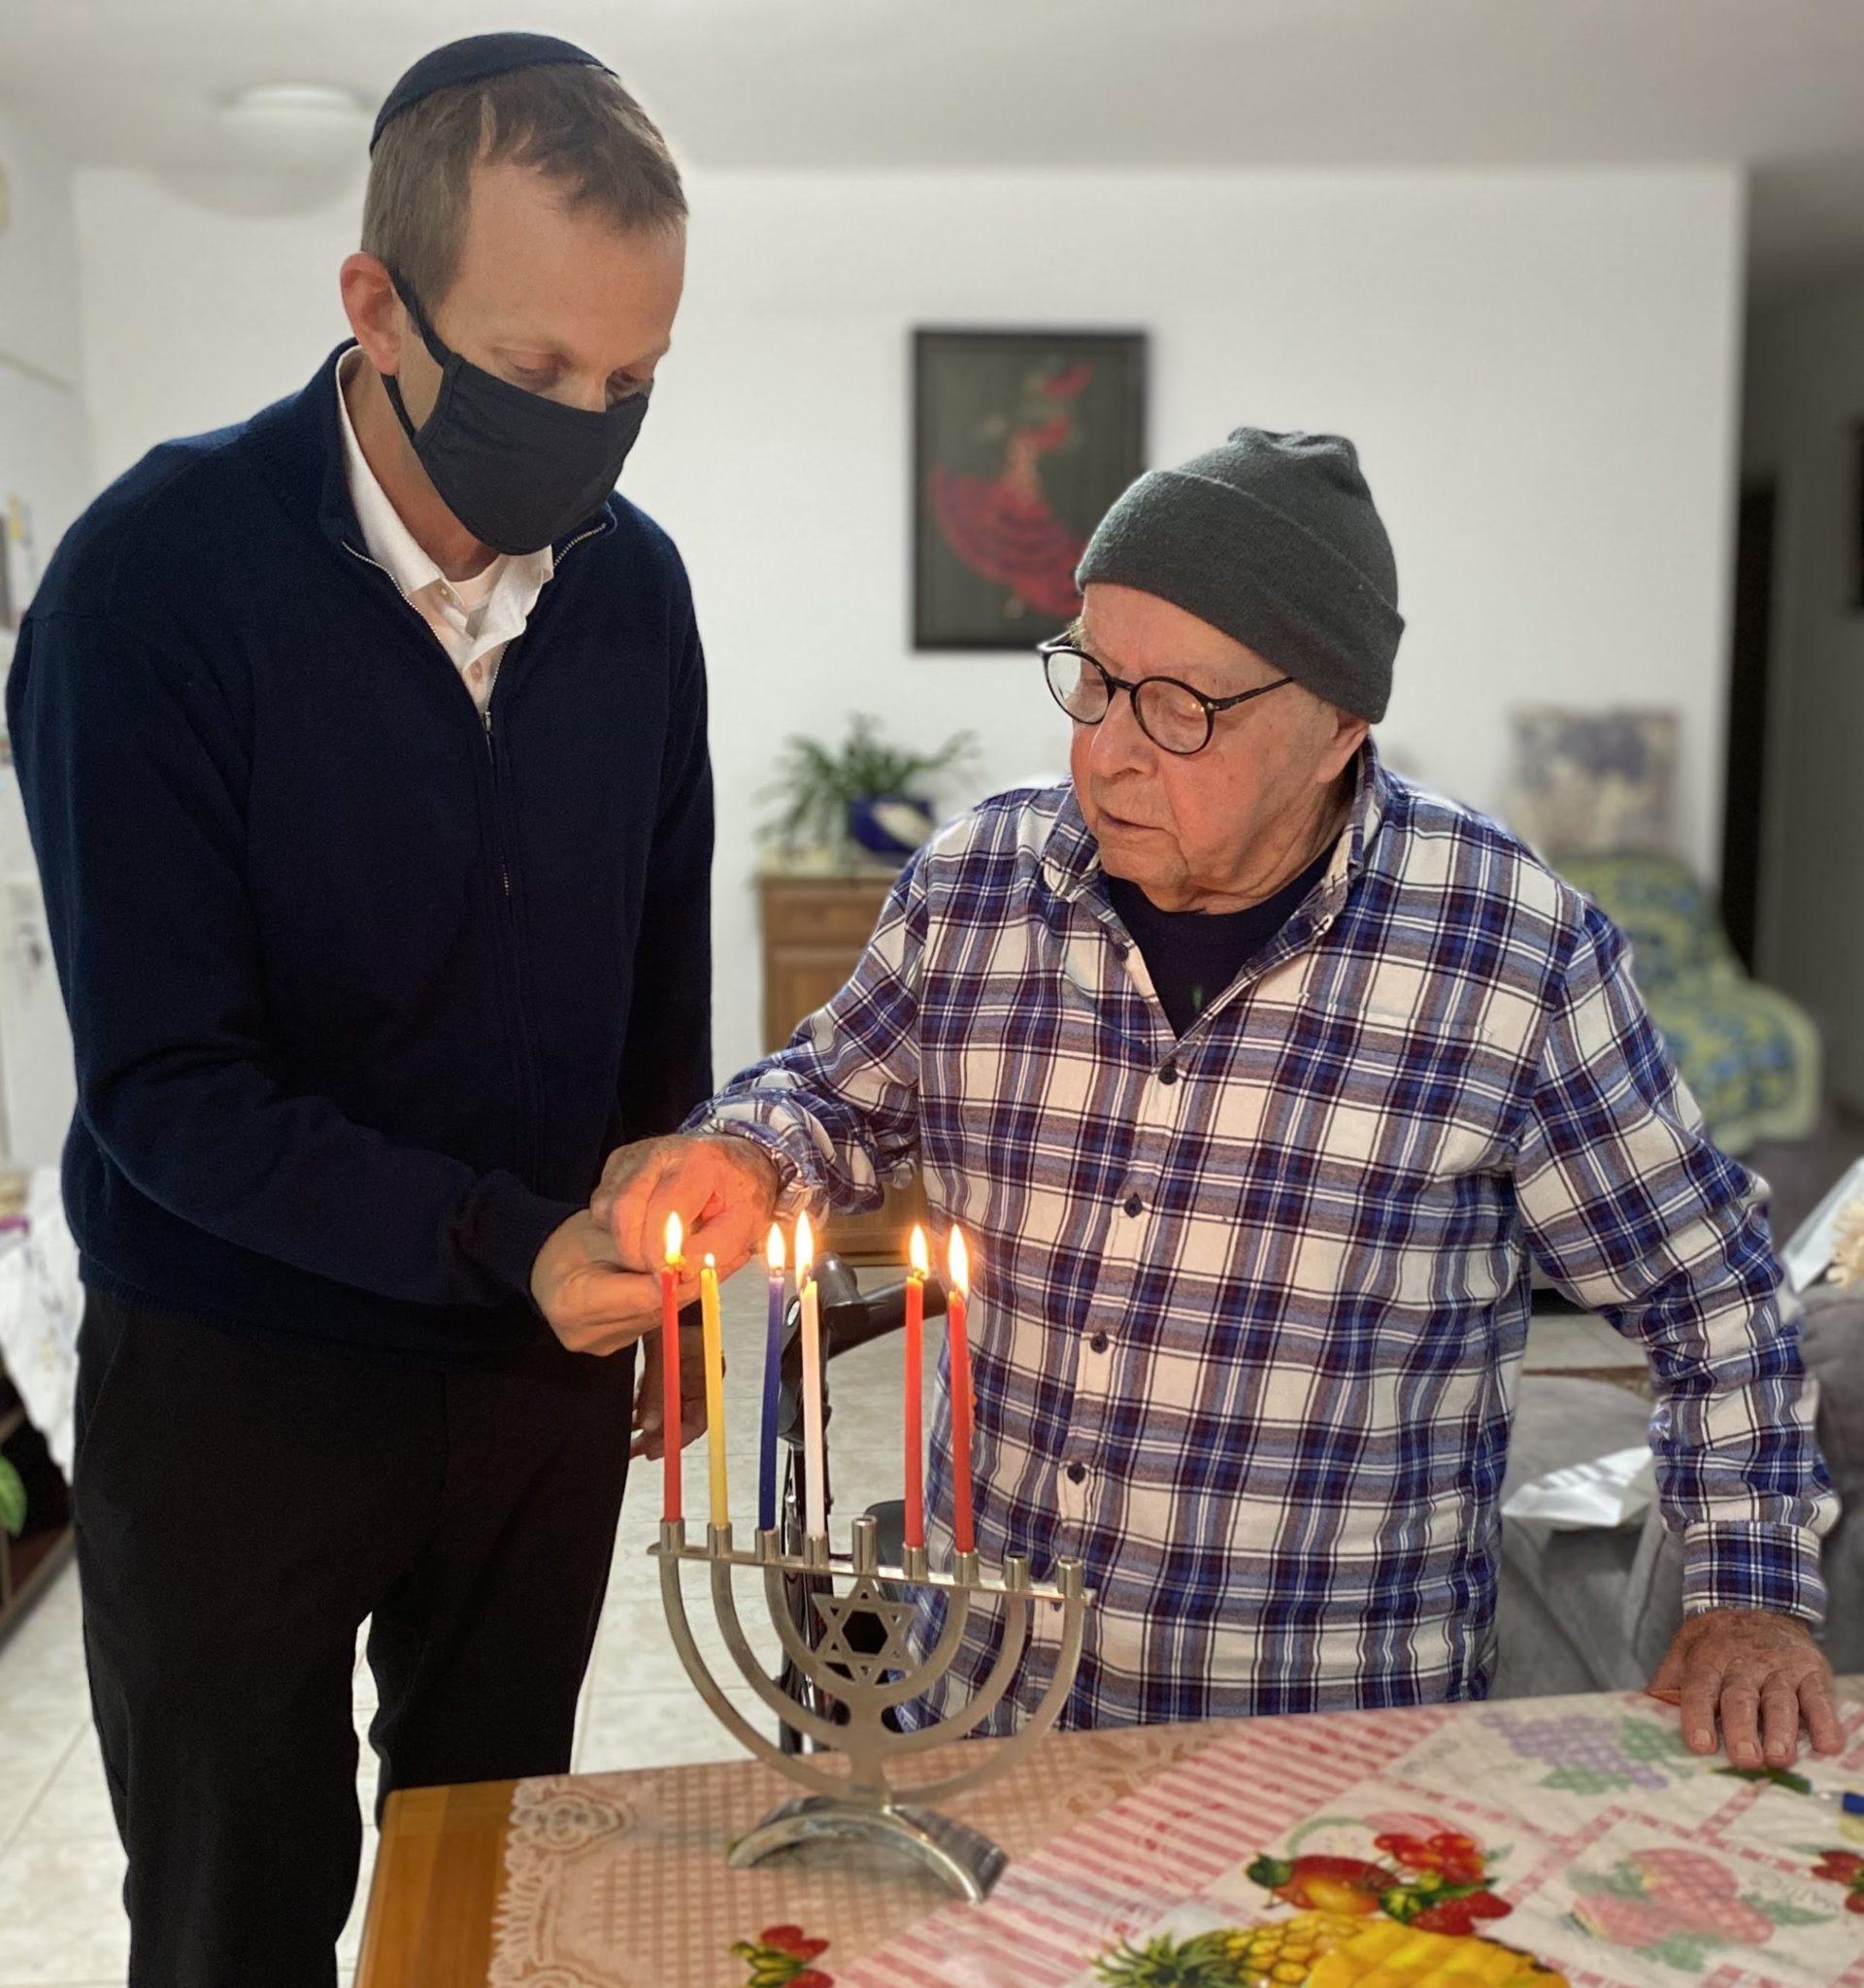 Rabbi tuly Weisz lighting chanukah lights holocaust survivor